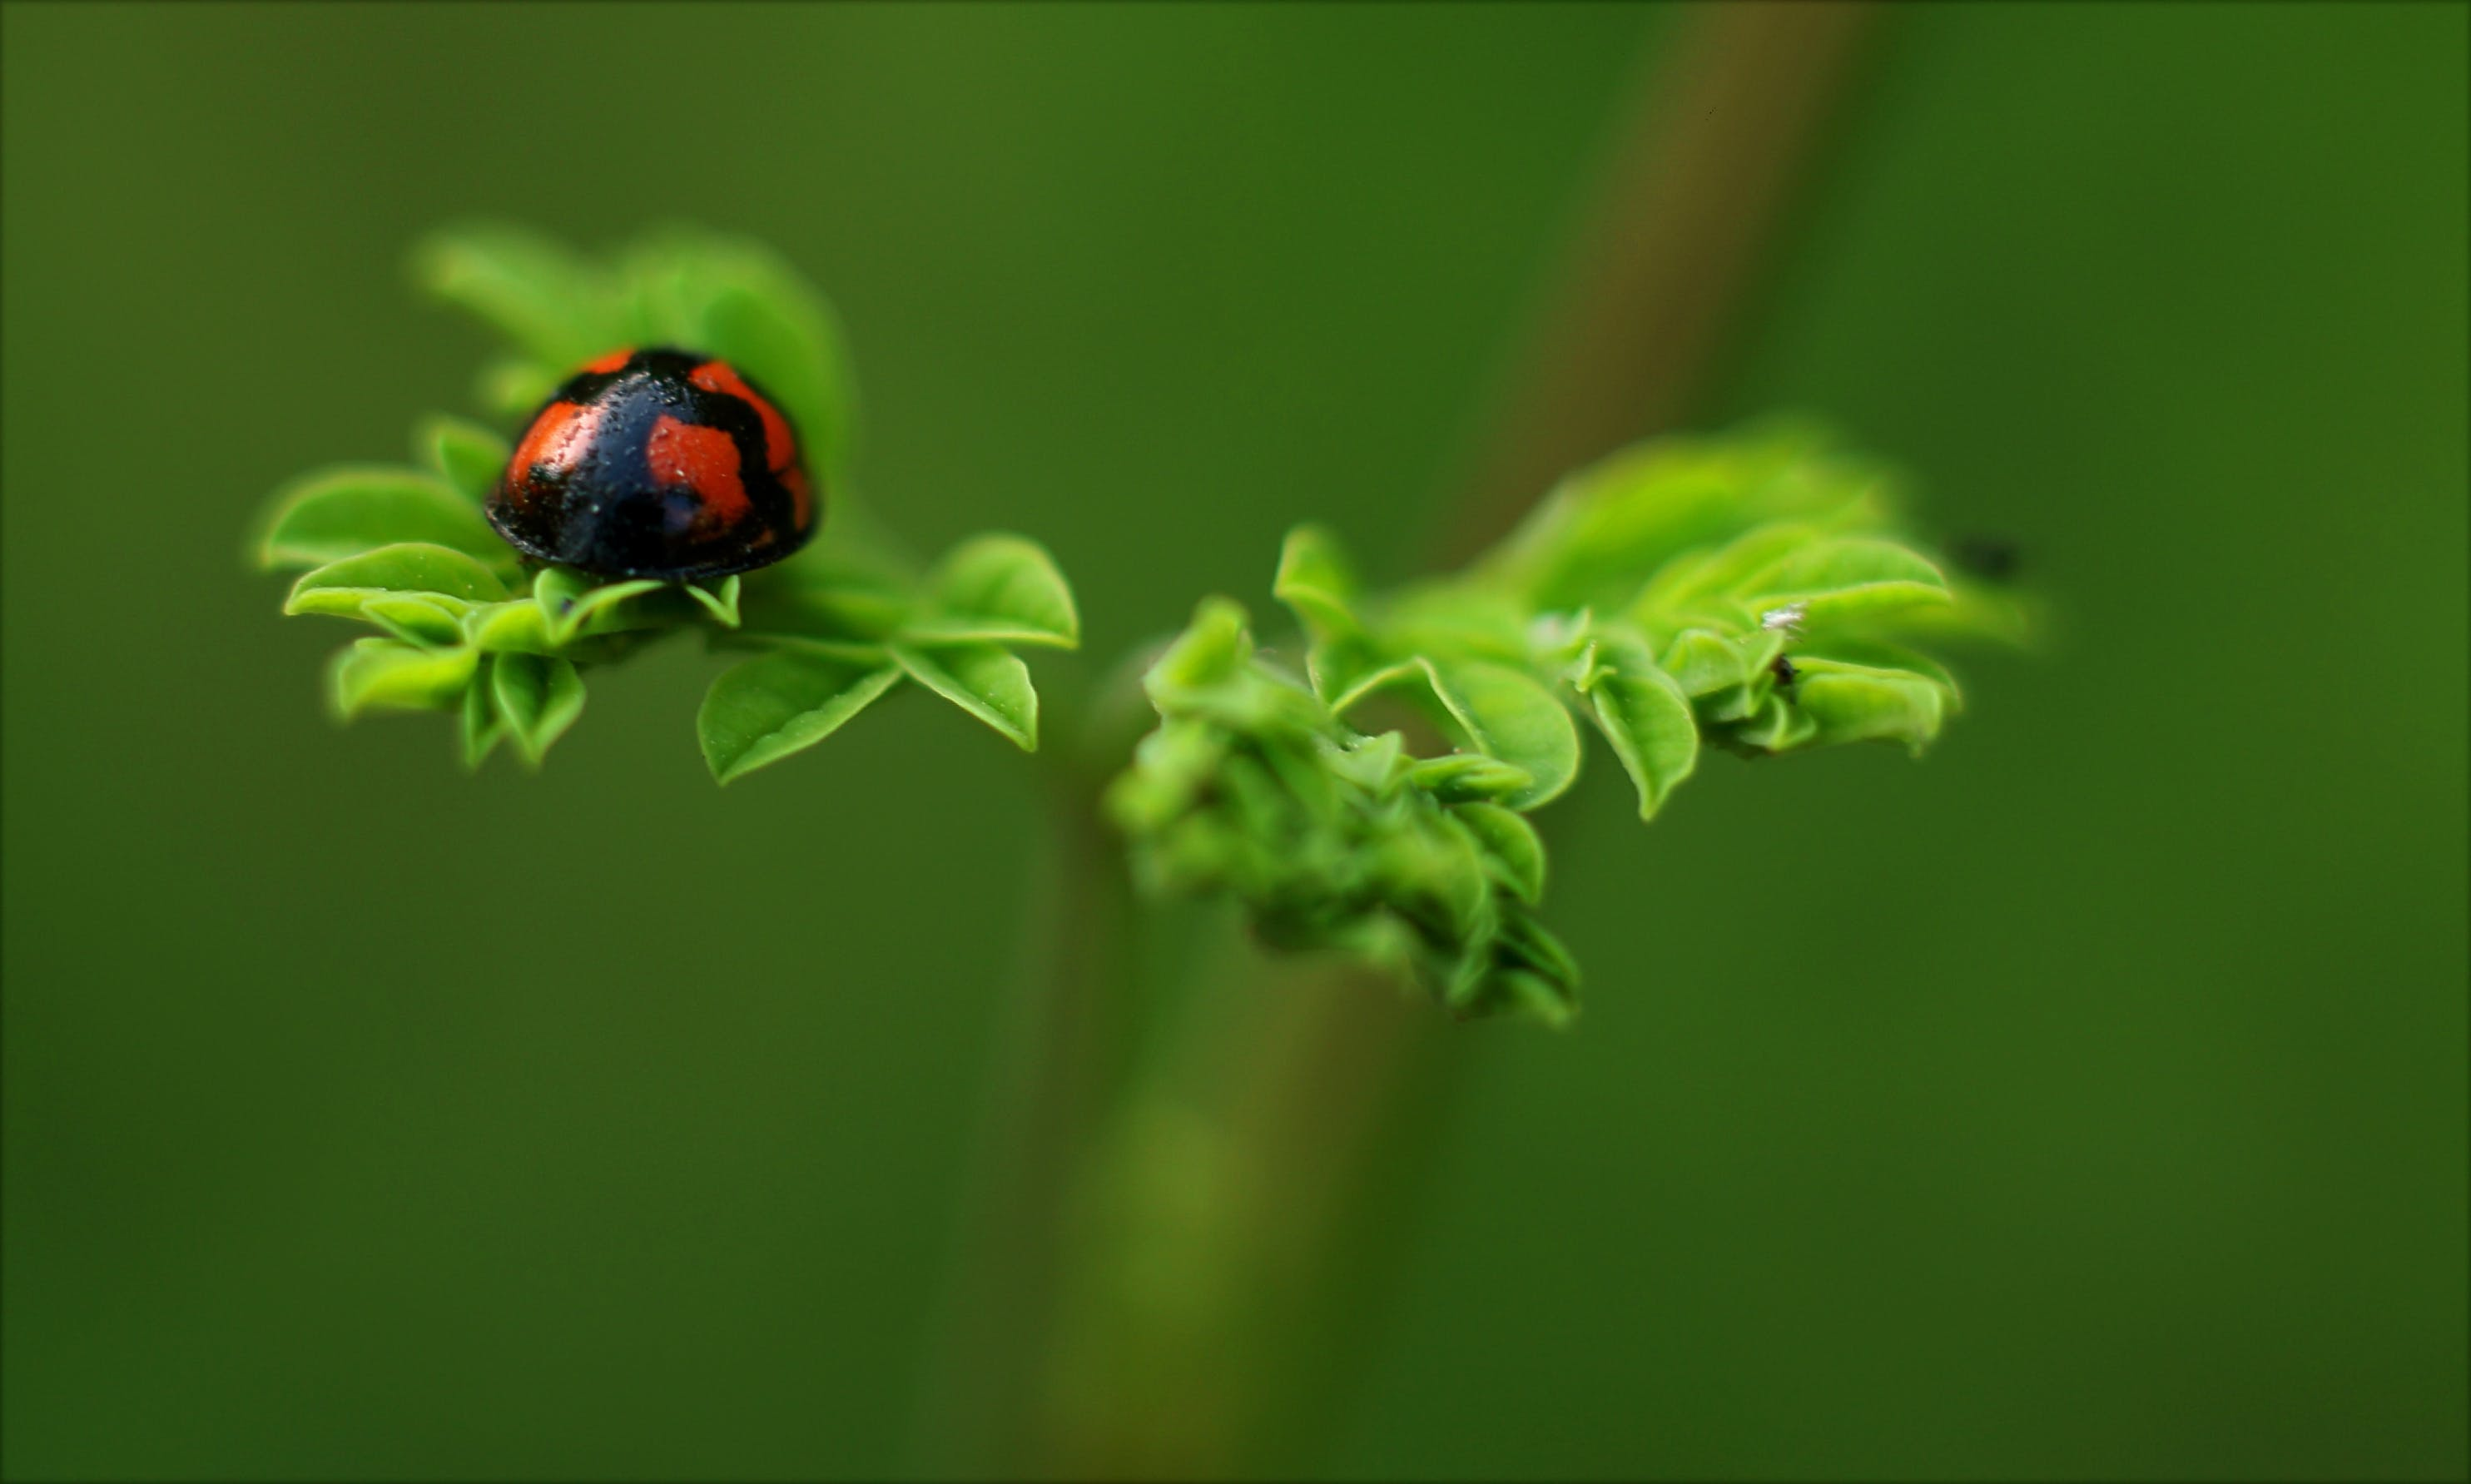 biologie, blätter, flora